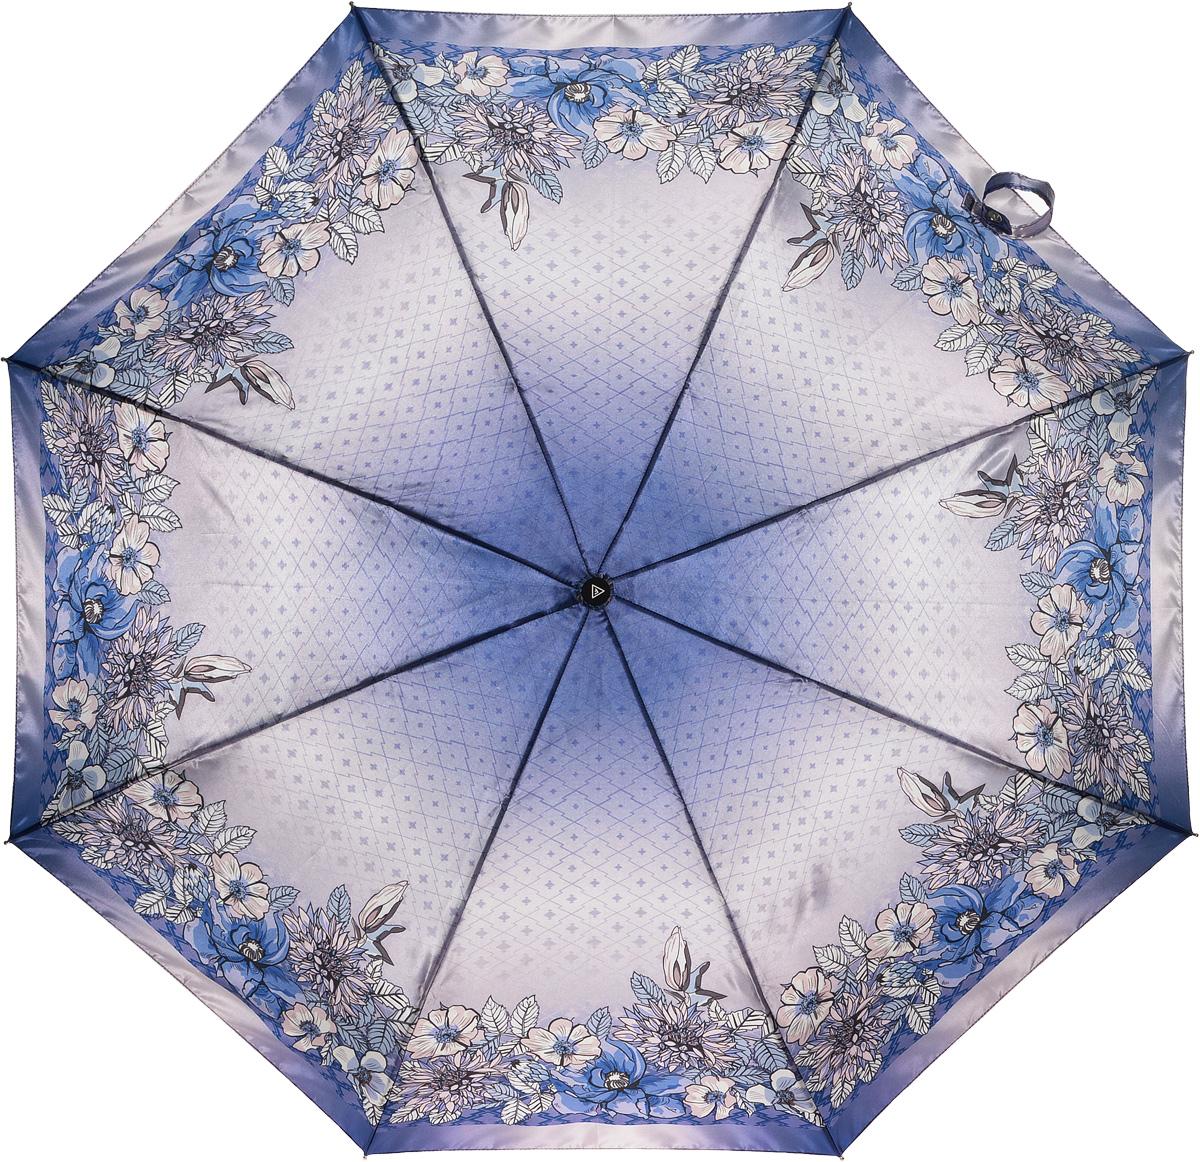 Зонт женский Fabretti, автомат, 3 сложения, цвет: мультиколор. L-16105-2L-16105-2Зонт женский Fabretti, облегченный суперавтомат, 3 сложения